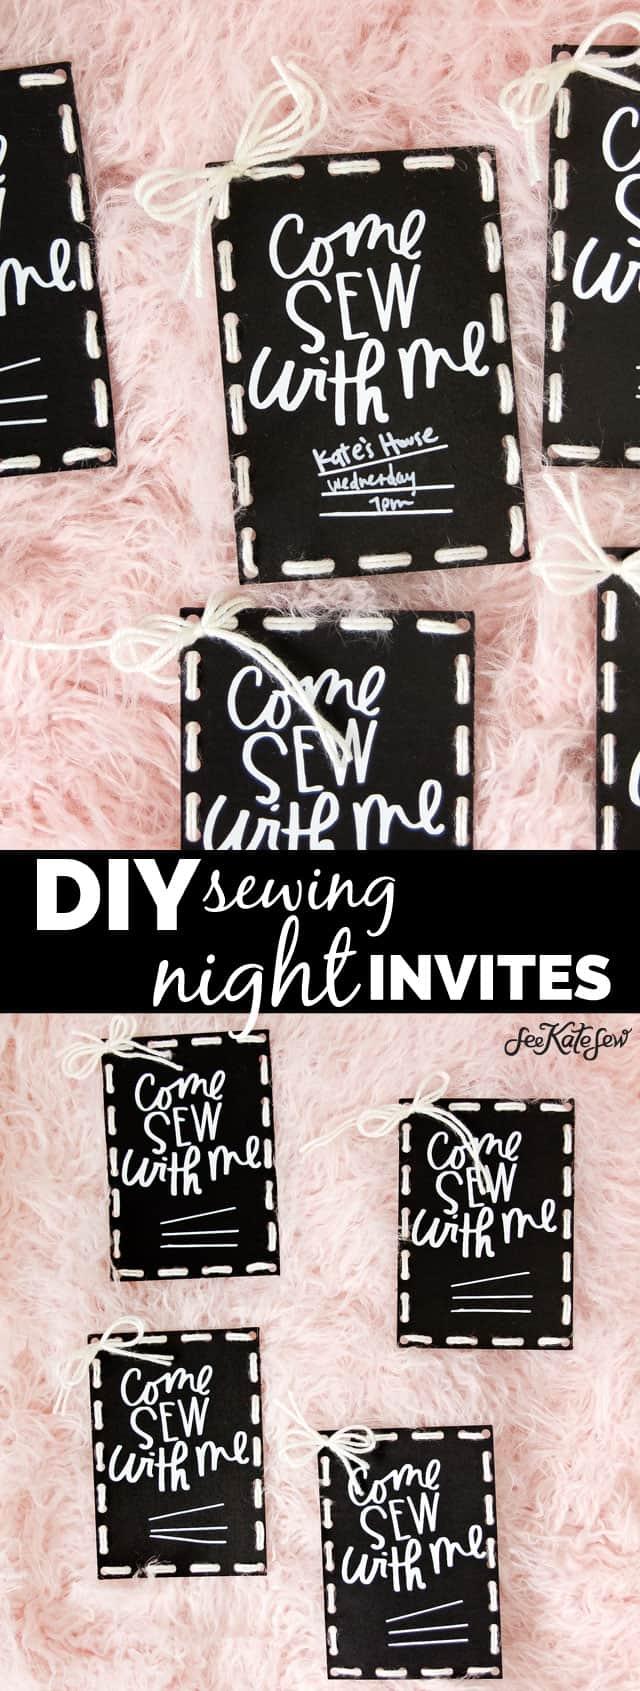 Sewing Night DIY Invites | Sewing Night Invitation! | diy invitations | party invitation ideas | cricut maker tutorials | sewing themed invitations || See Kate Sew #diyinvitations #cricut #critcutdiy